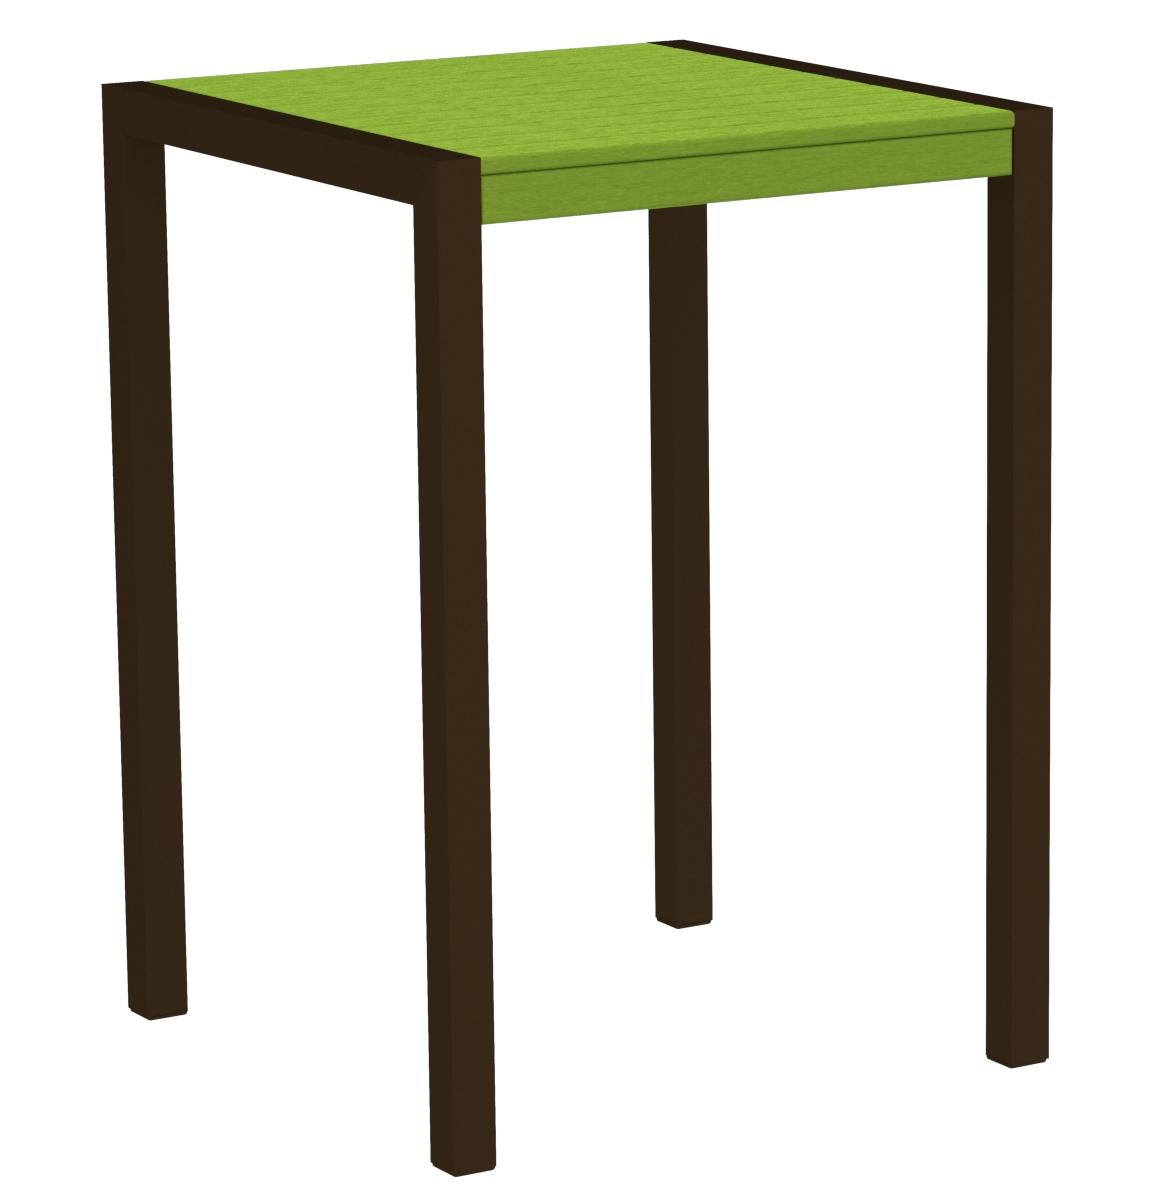 POLYWOOD 8002-16LI MOD 30' Bar Table in Textured Bronze / Lime